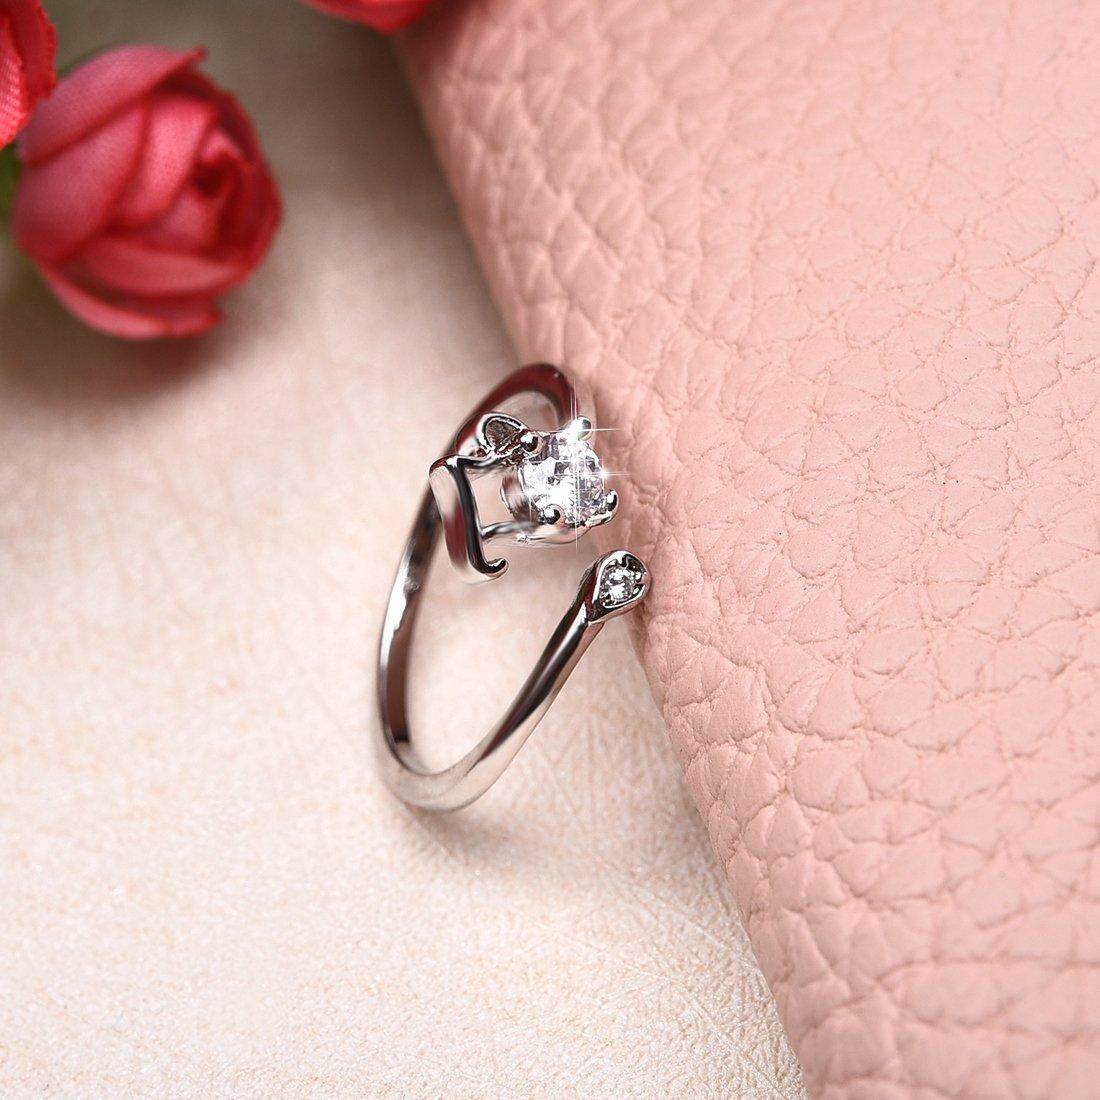 Amazon.com: OBSEDE Elegant Aquarius CZ Ring for Women Special Zodiac ...